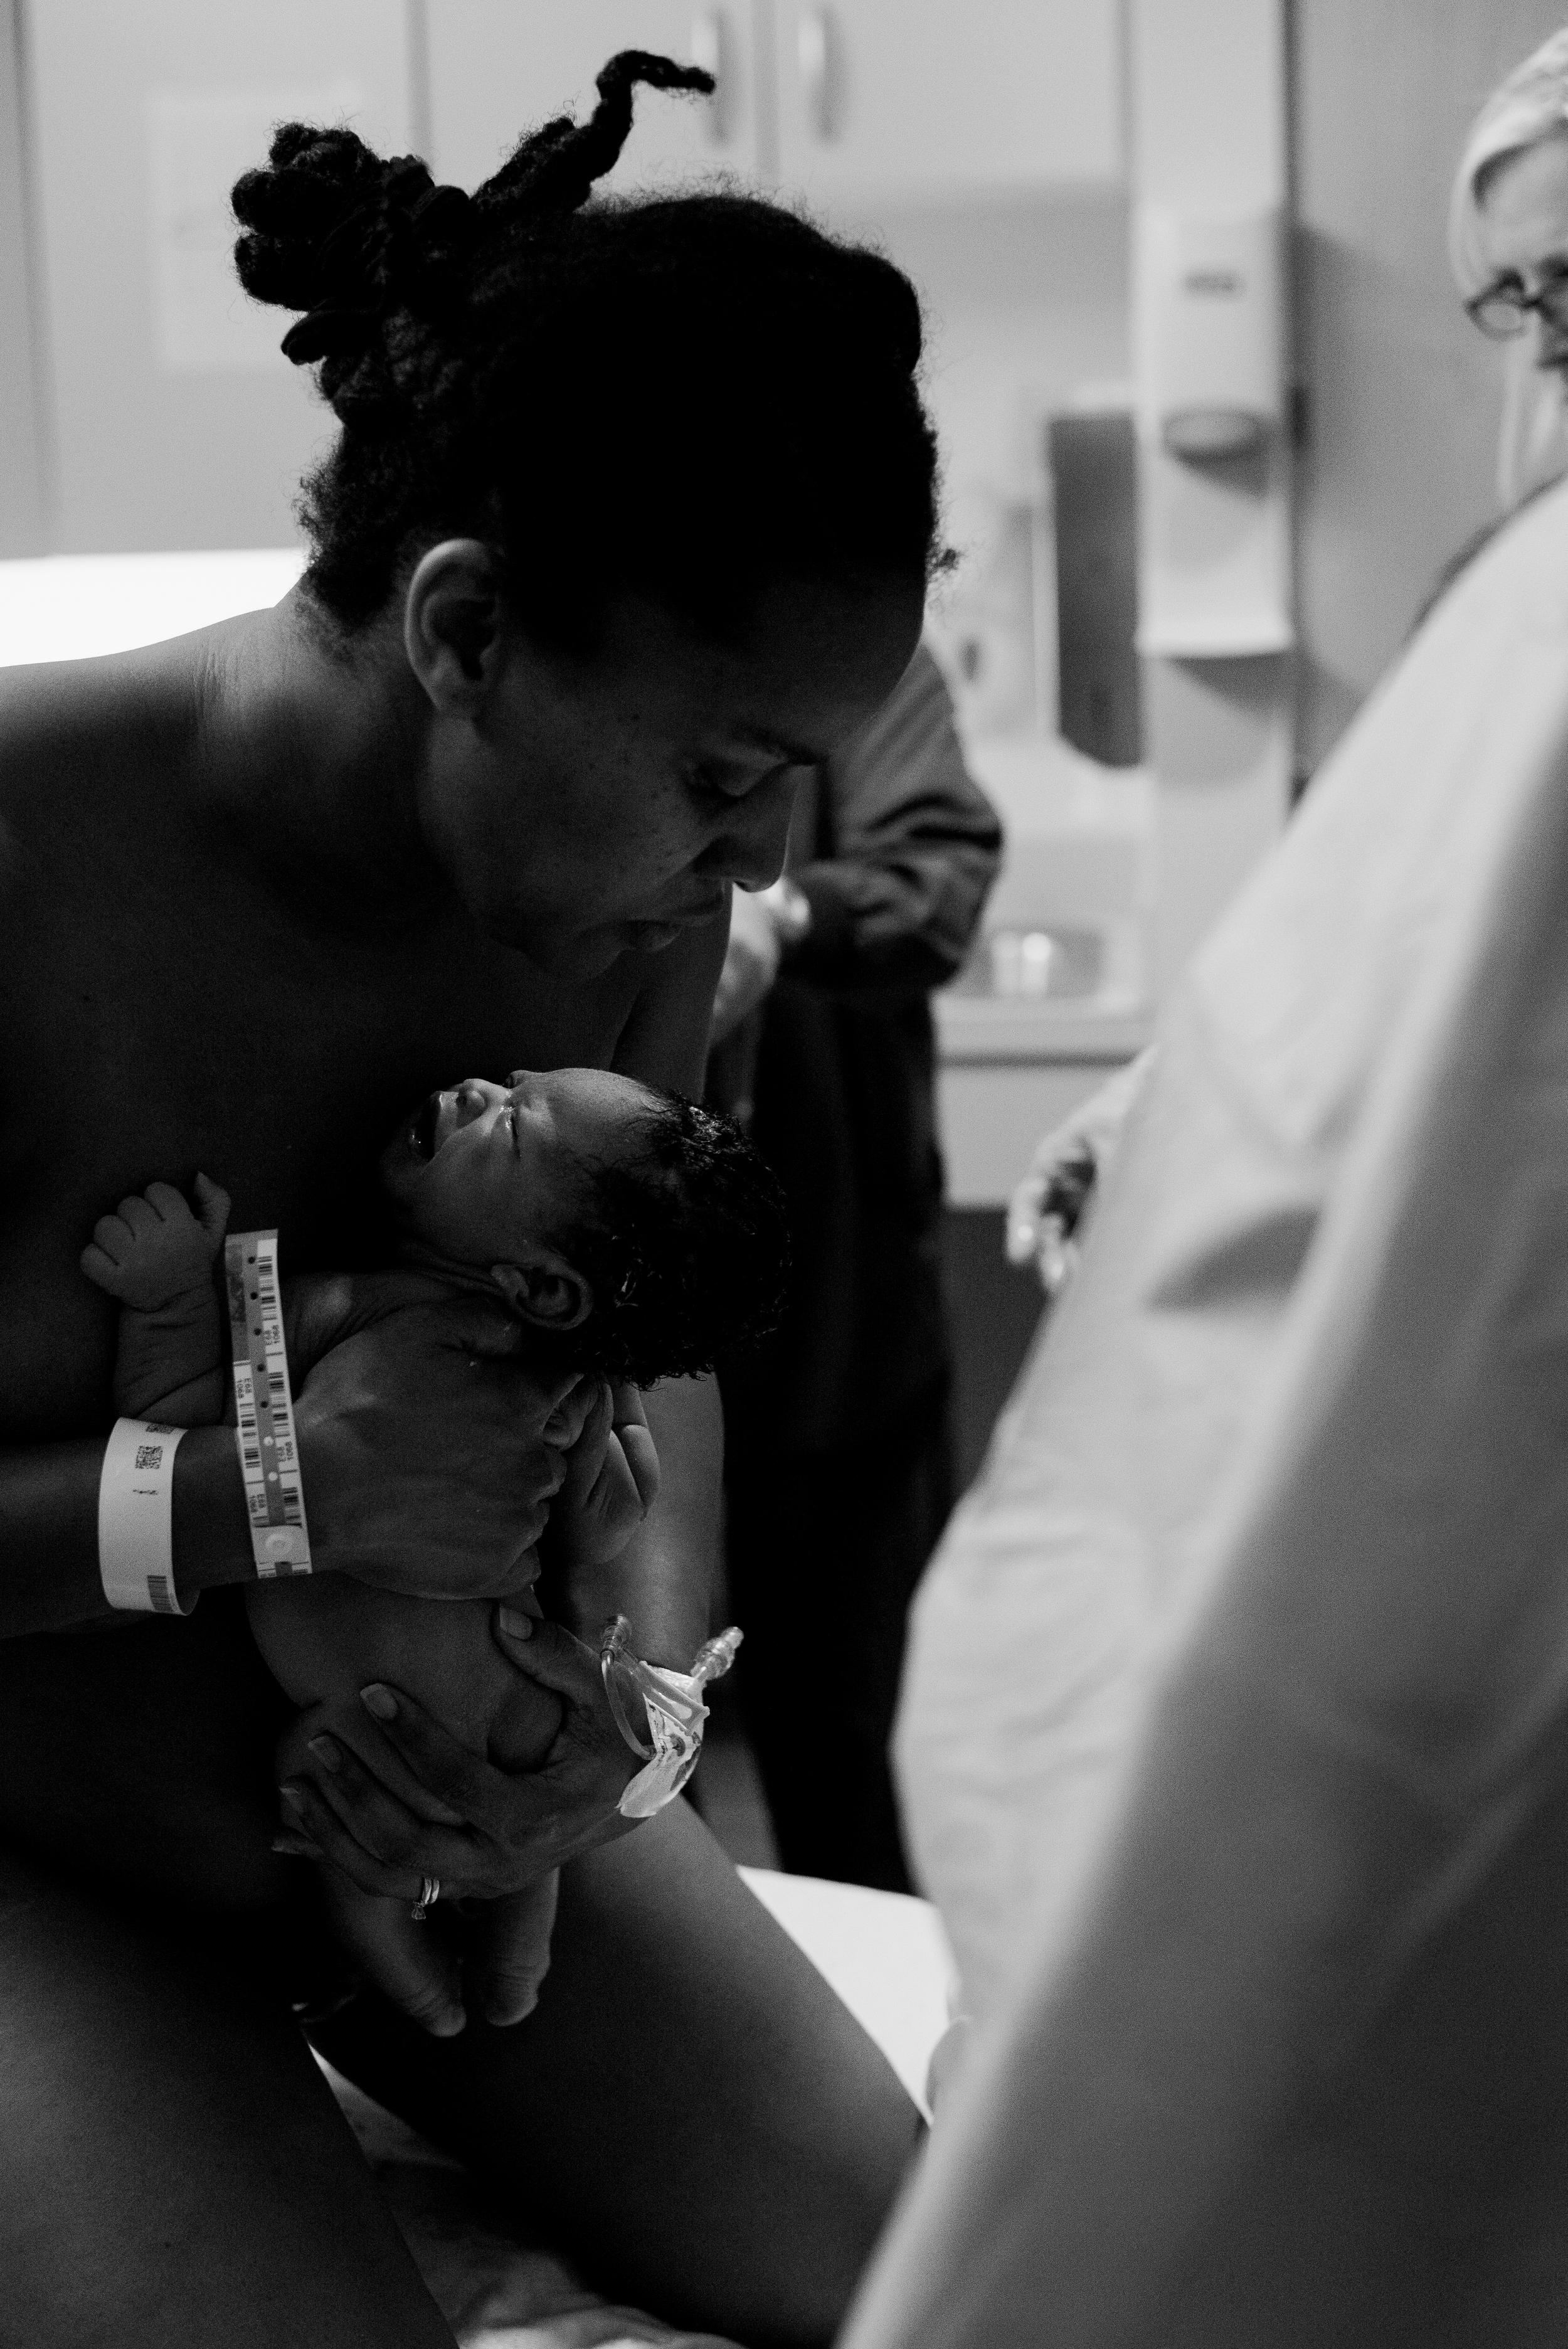 HBirth - Birth - Leesburg, VA - Birth Photography - Fresh 48 - Aimee Durrance Photography-432.jpg